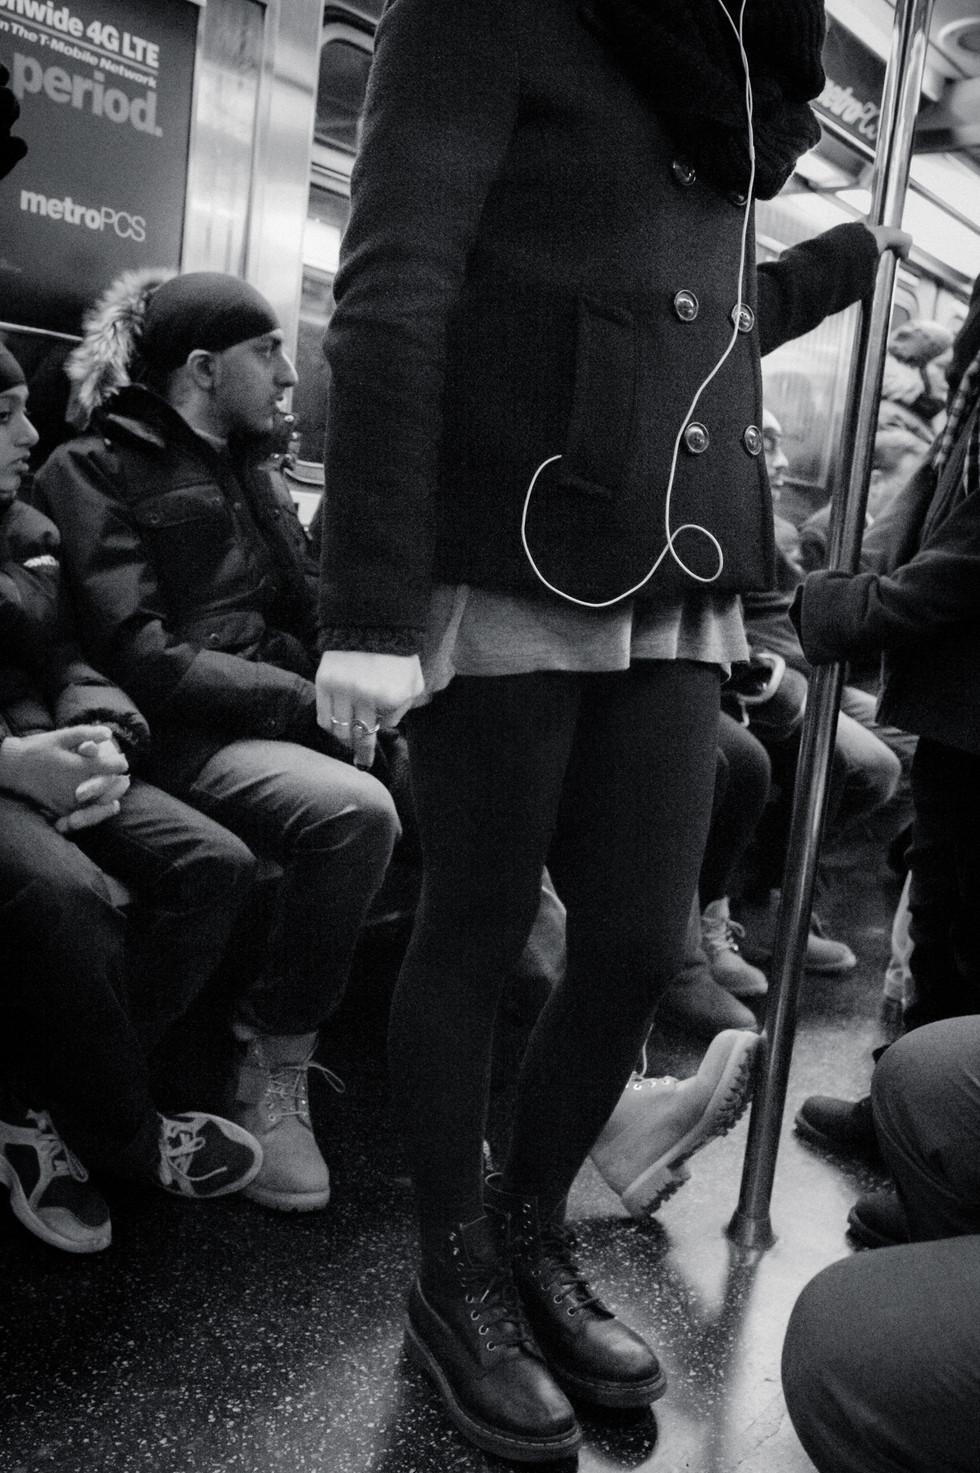 20141230-new york city-26714.jpg